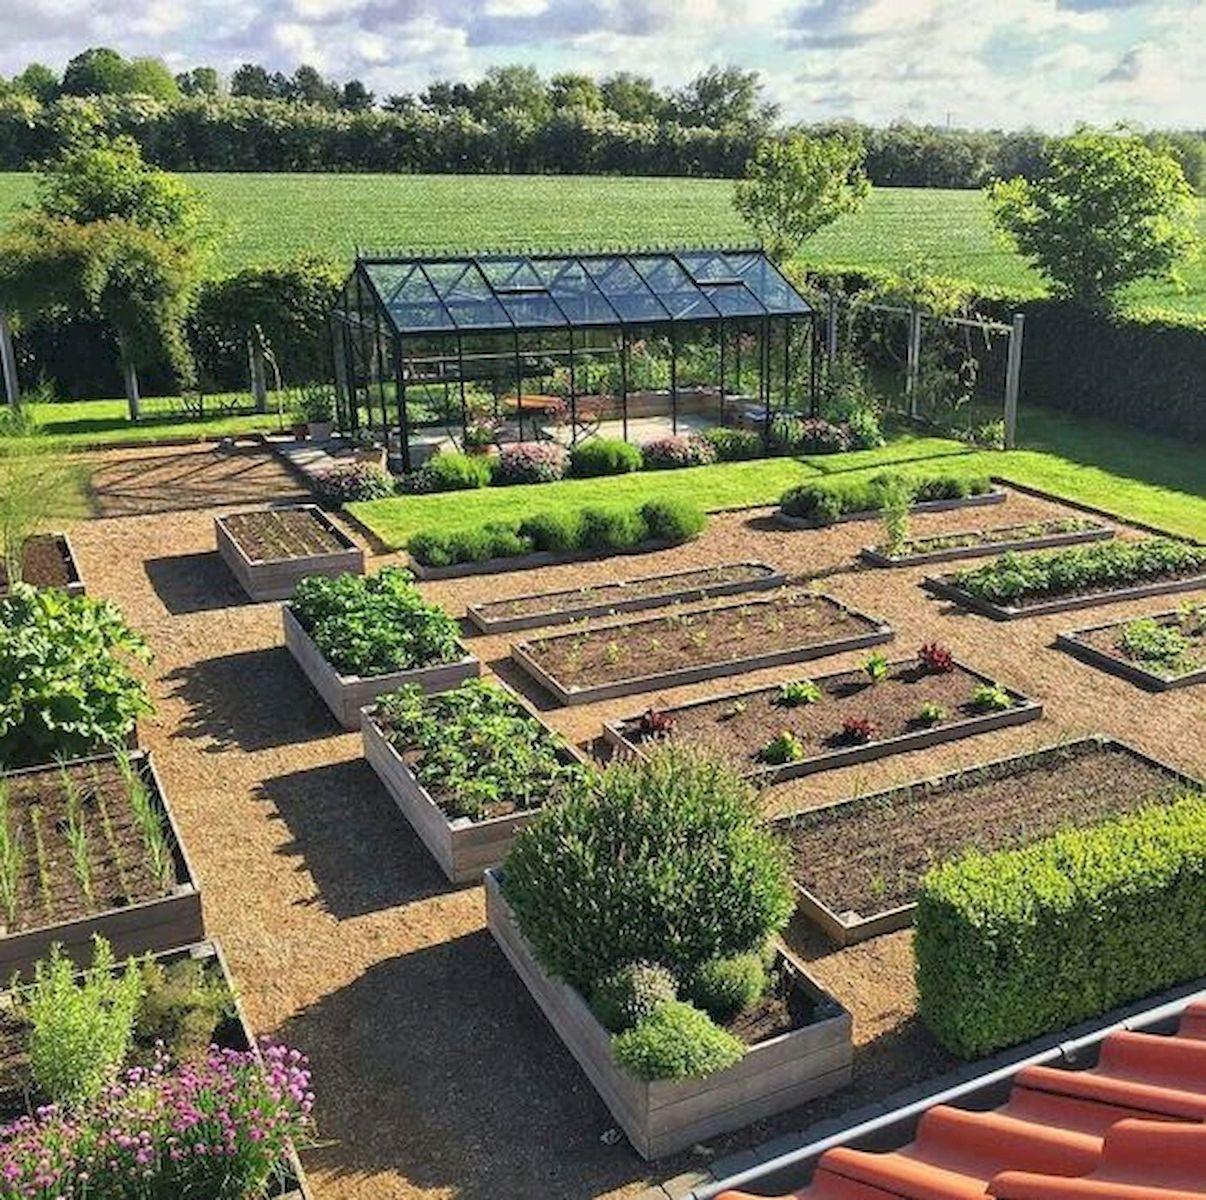 35 Advantageous Small Vegetable Garden Ideas For Your: 40 Stunning Vegetable Garden Design Ideas Perfect For